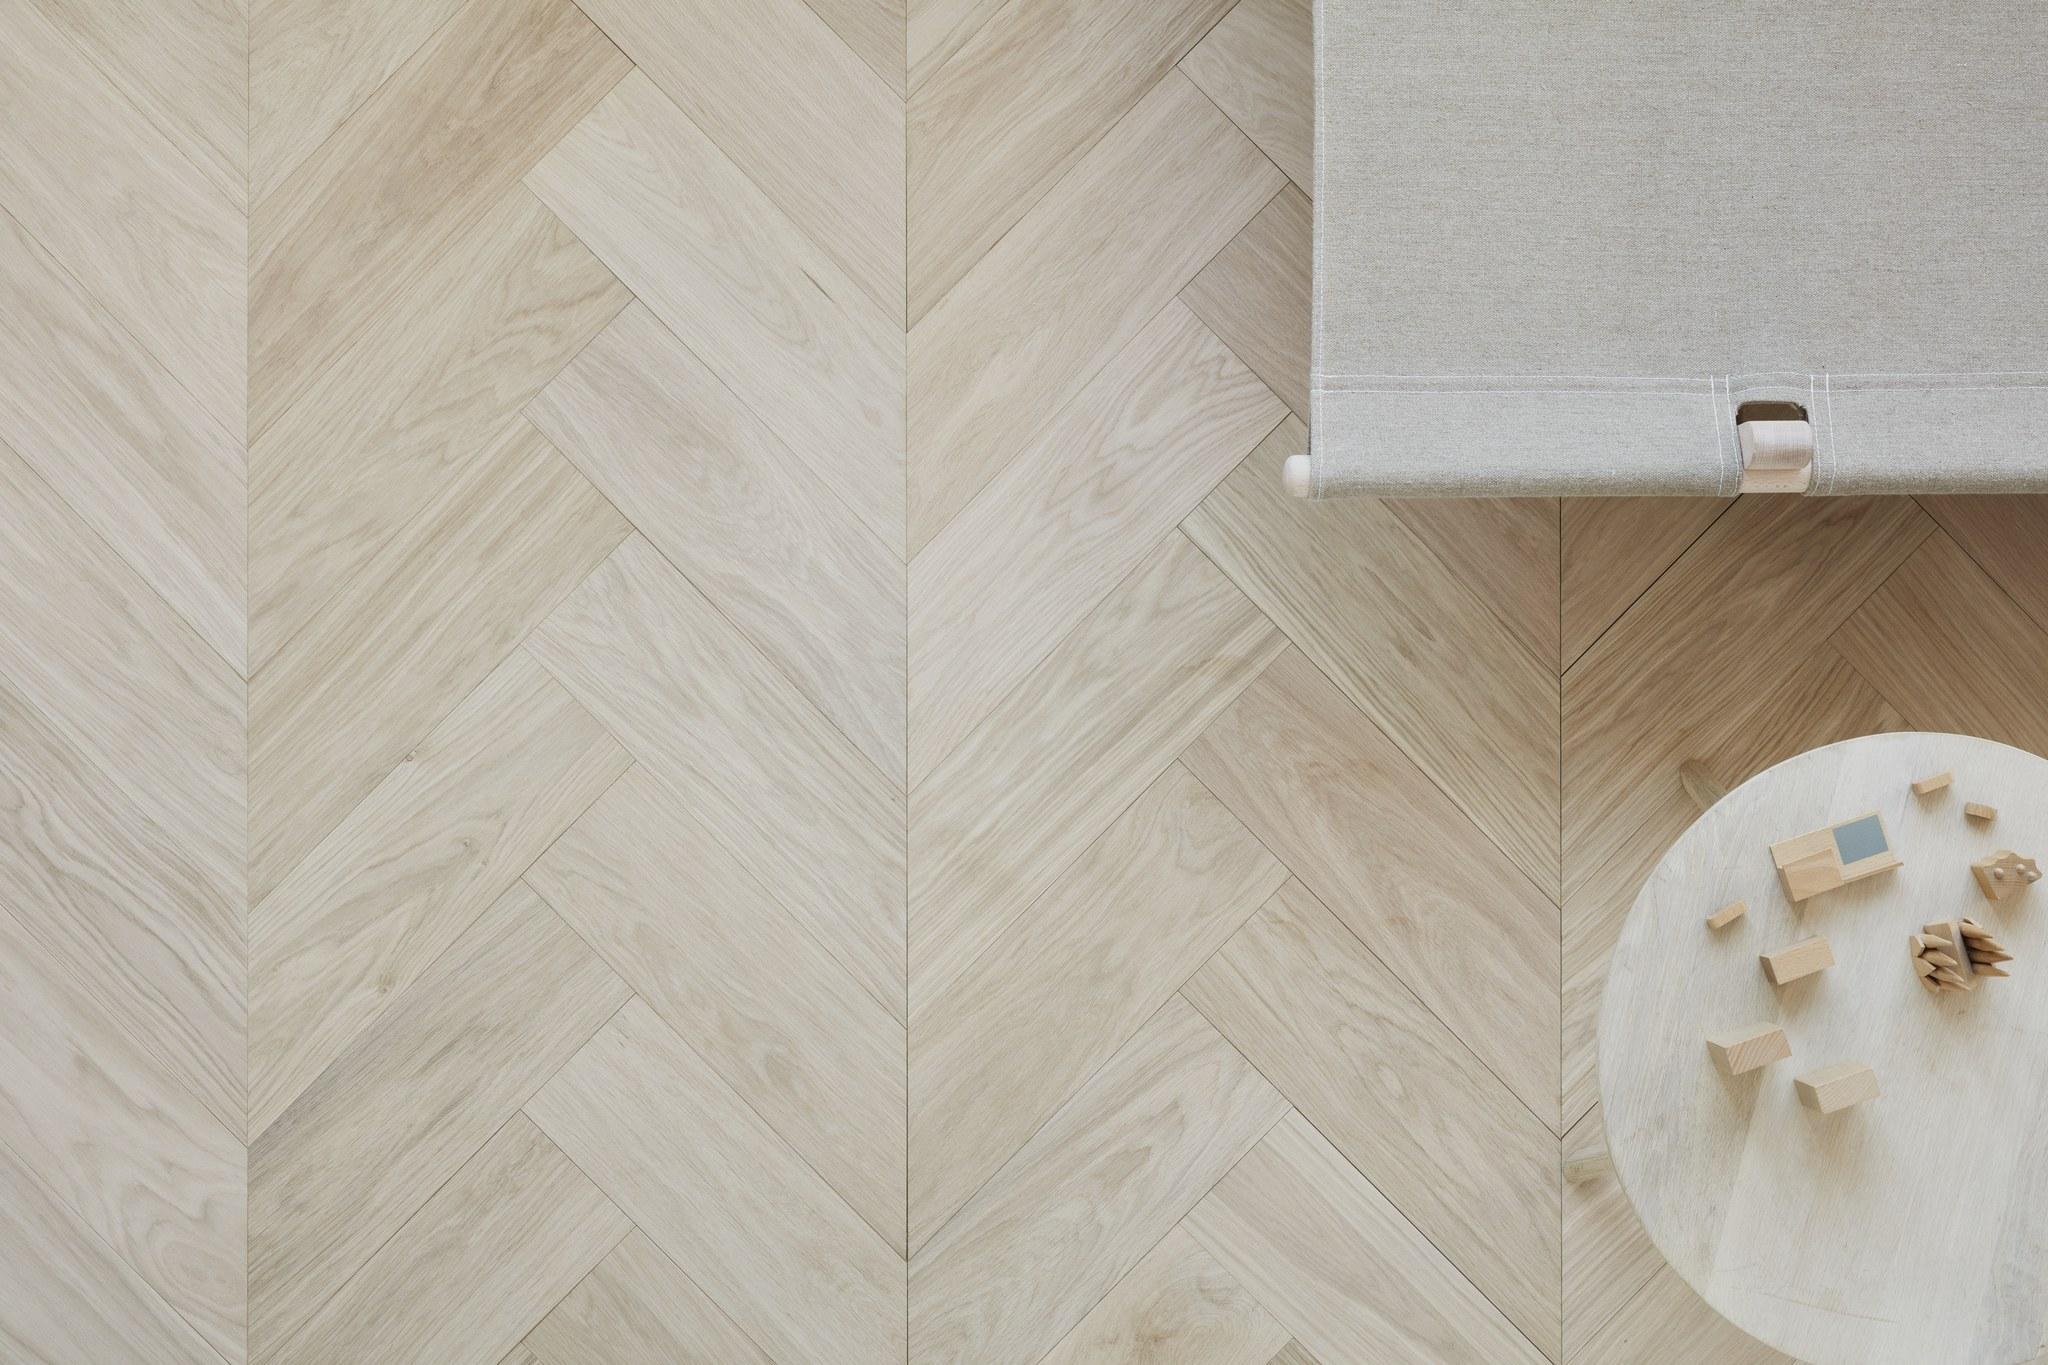 Timberwise Tammi Oak Design Floor ChevBone NORDIC Hiottu Sand Oljyvahattu Waxoil Vaaka